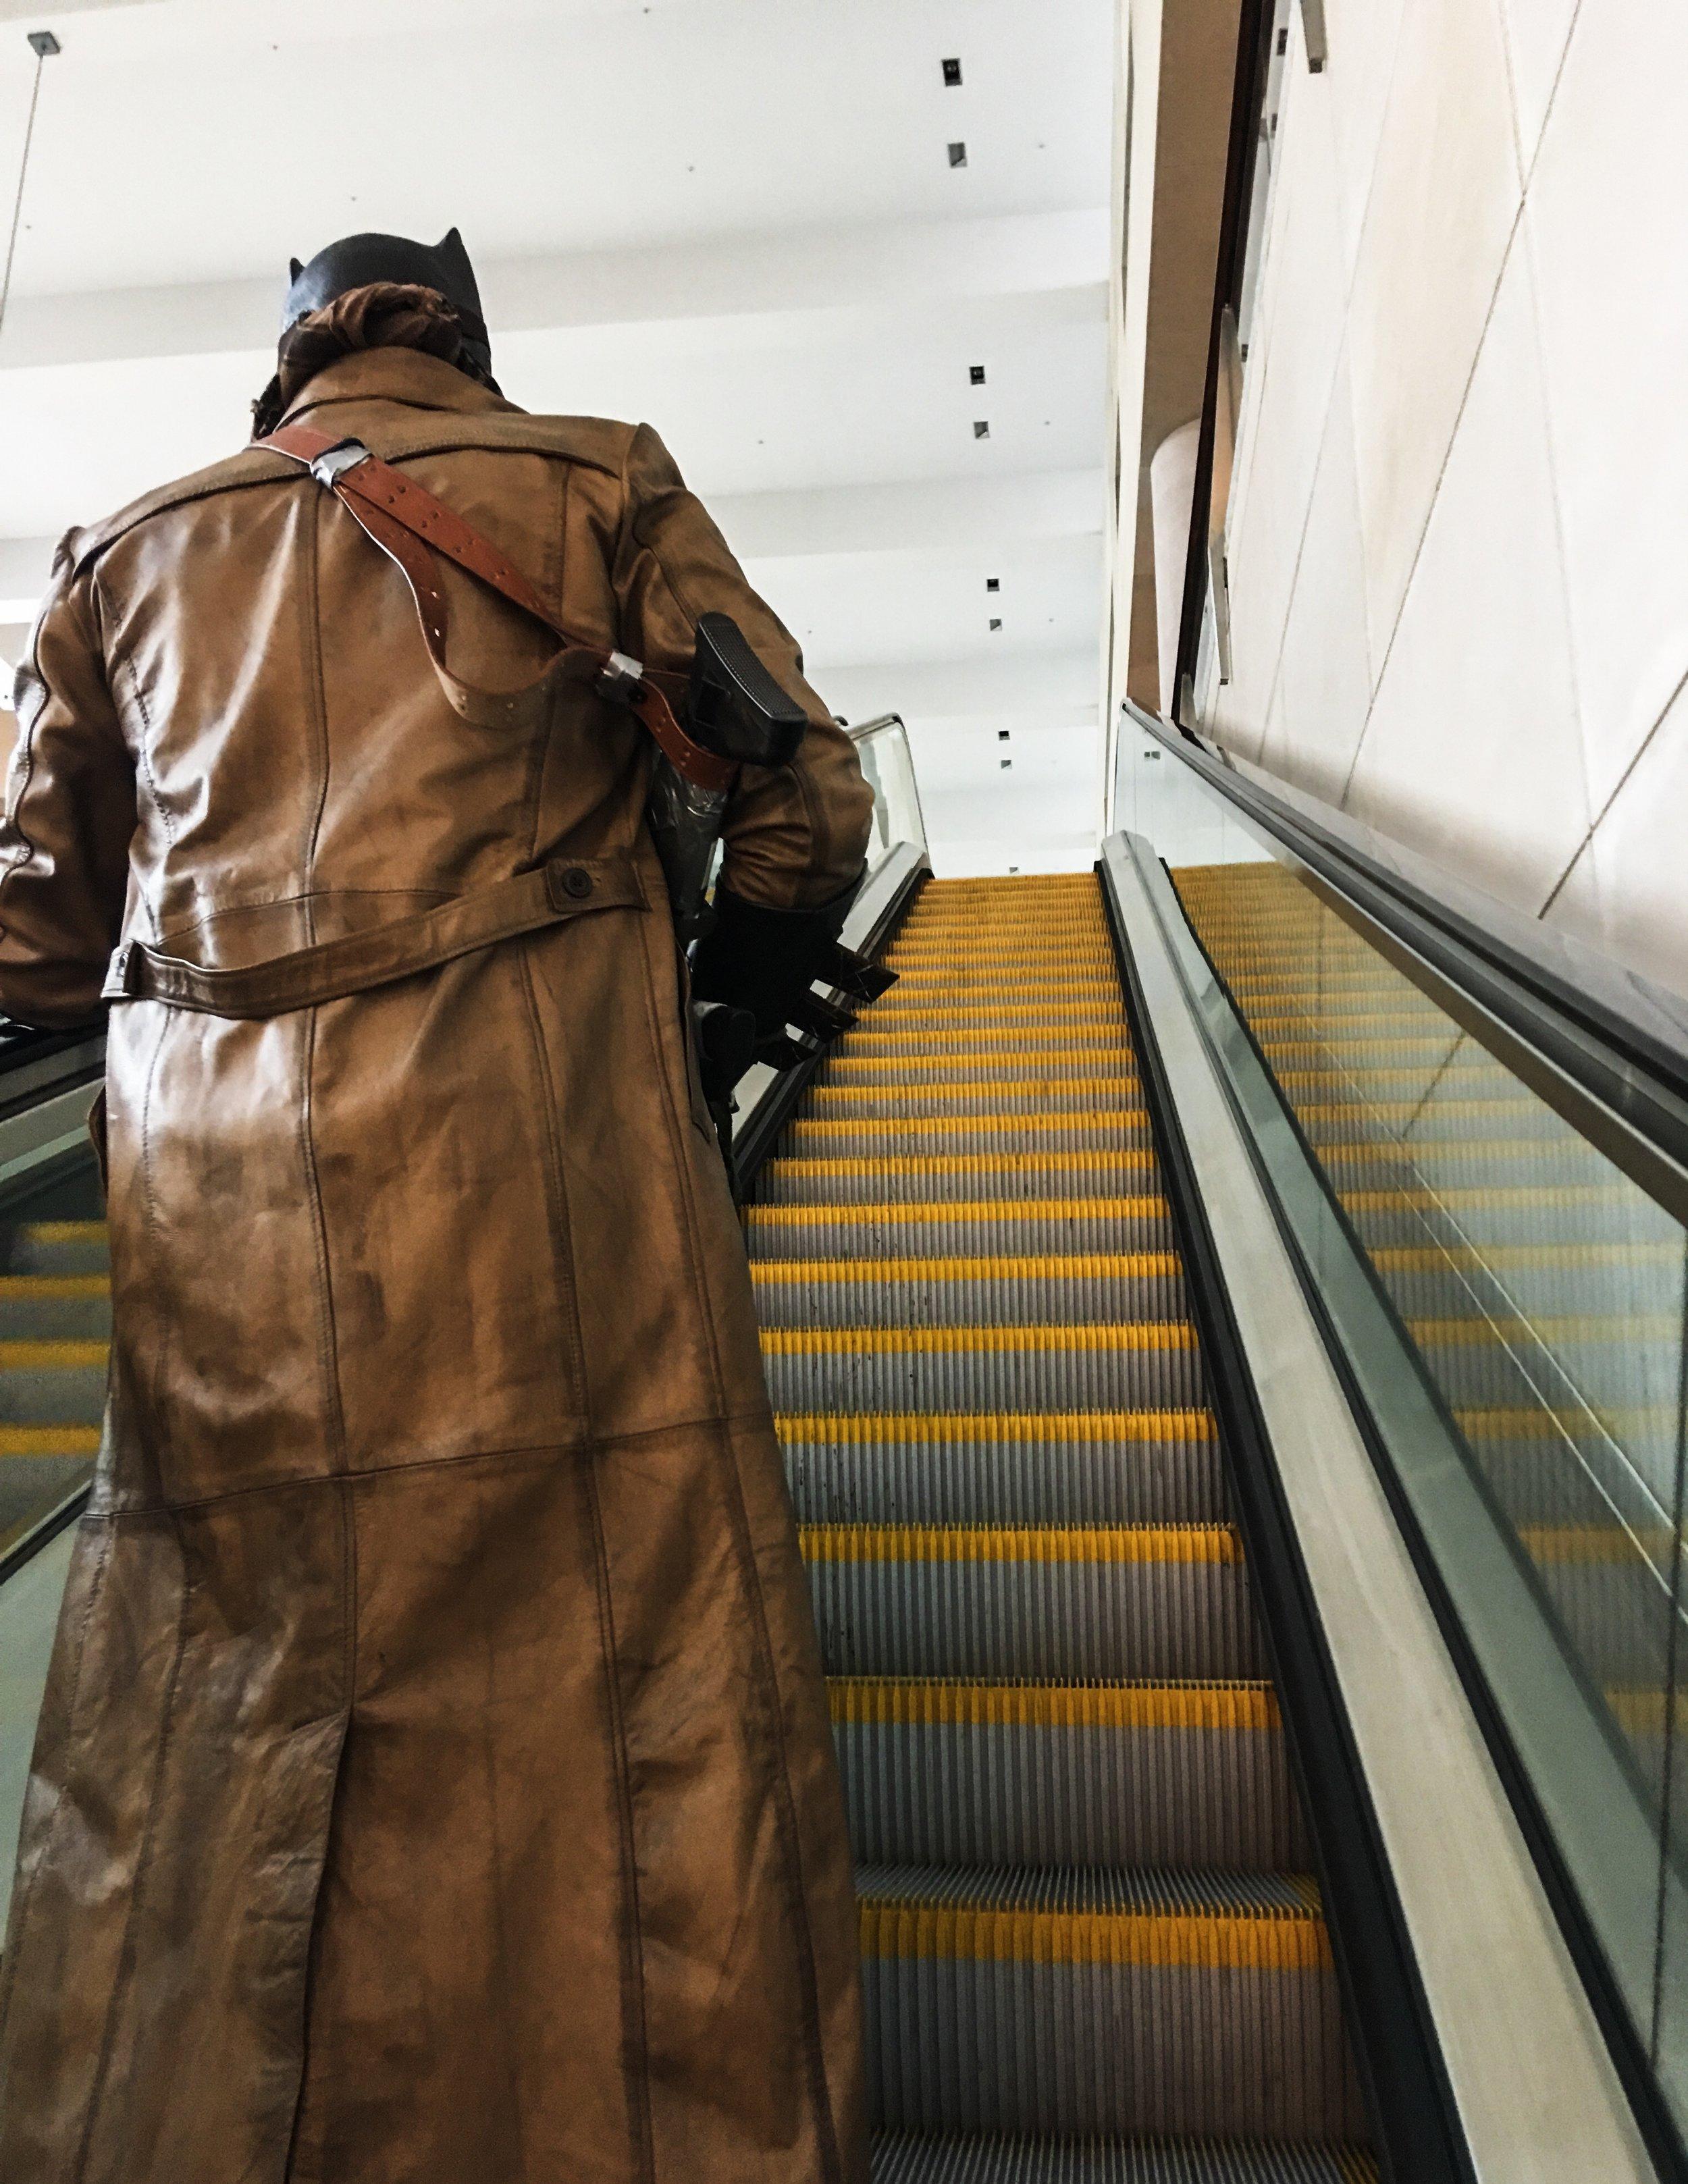 Same bat time, same bat escalator